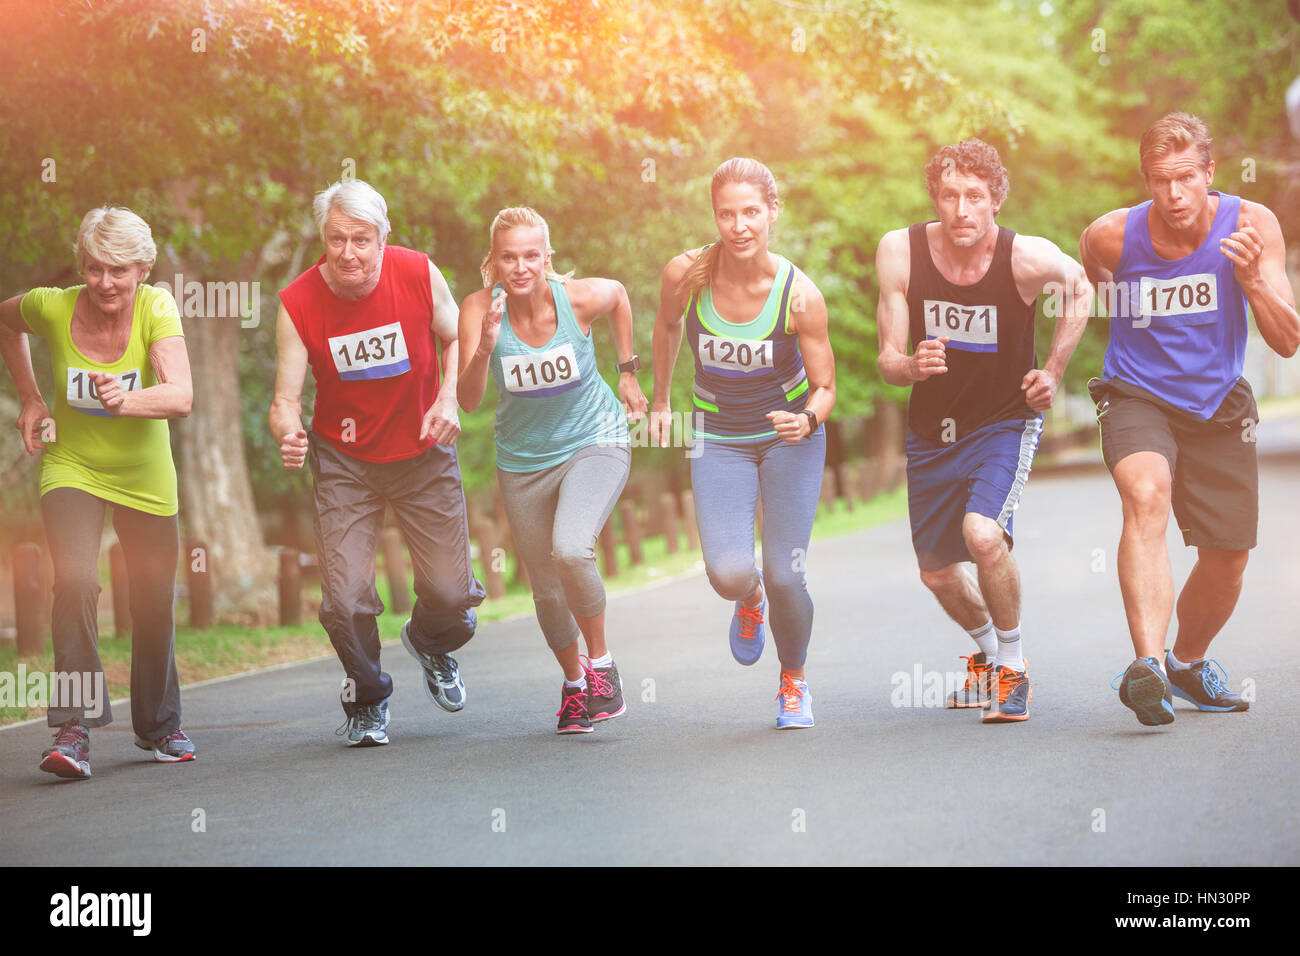 Marathon athletes on starting line in park - Stock Image